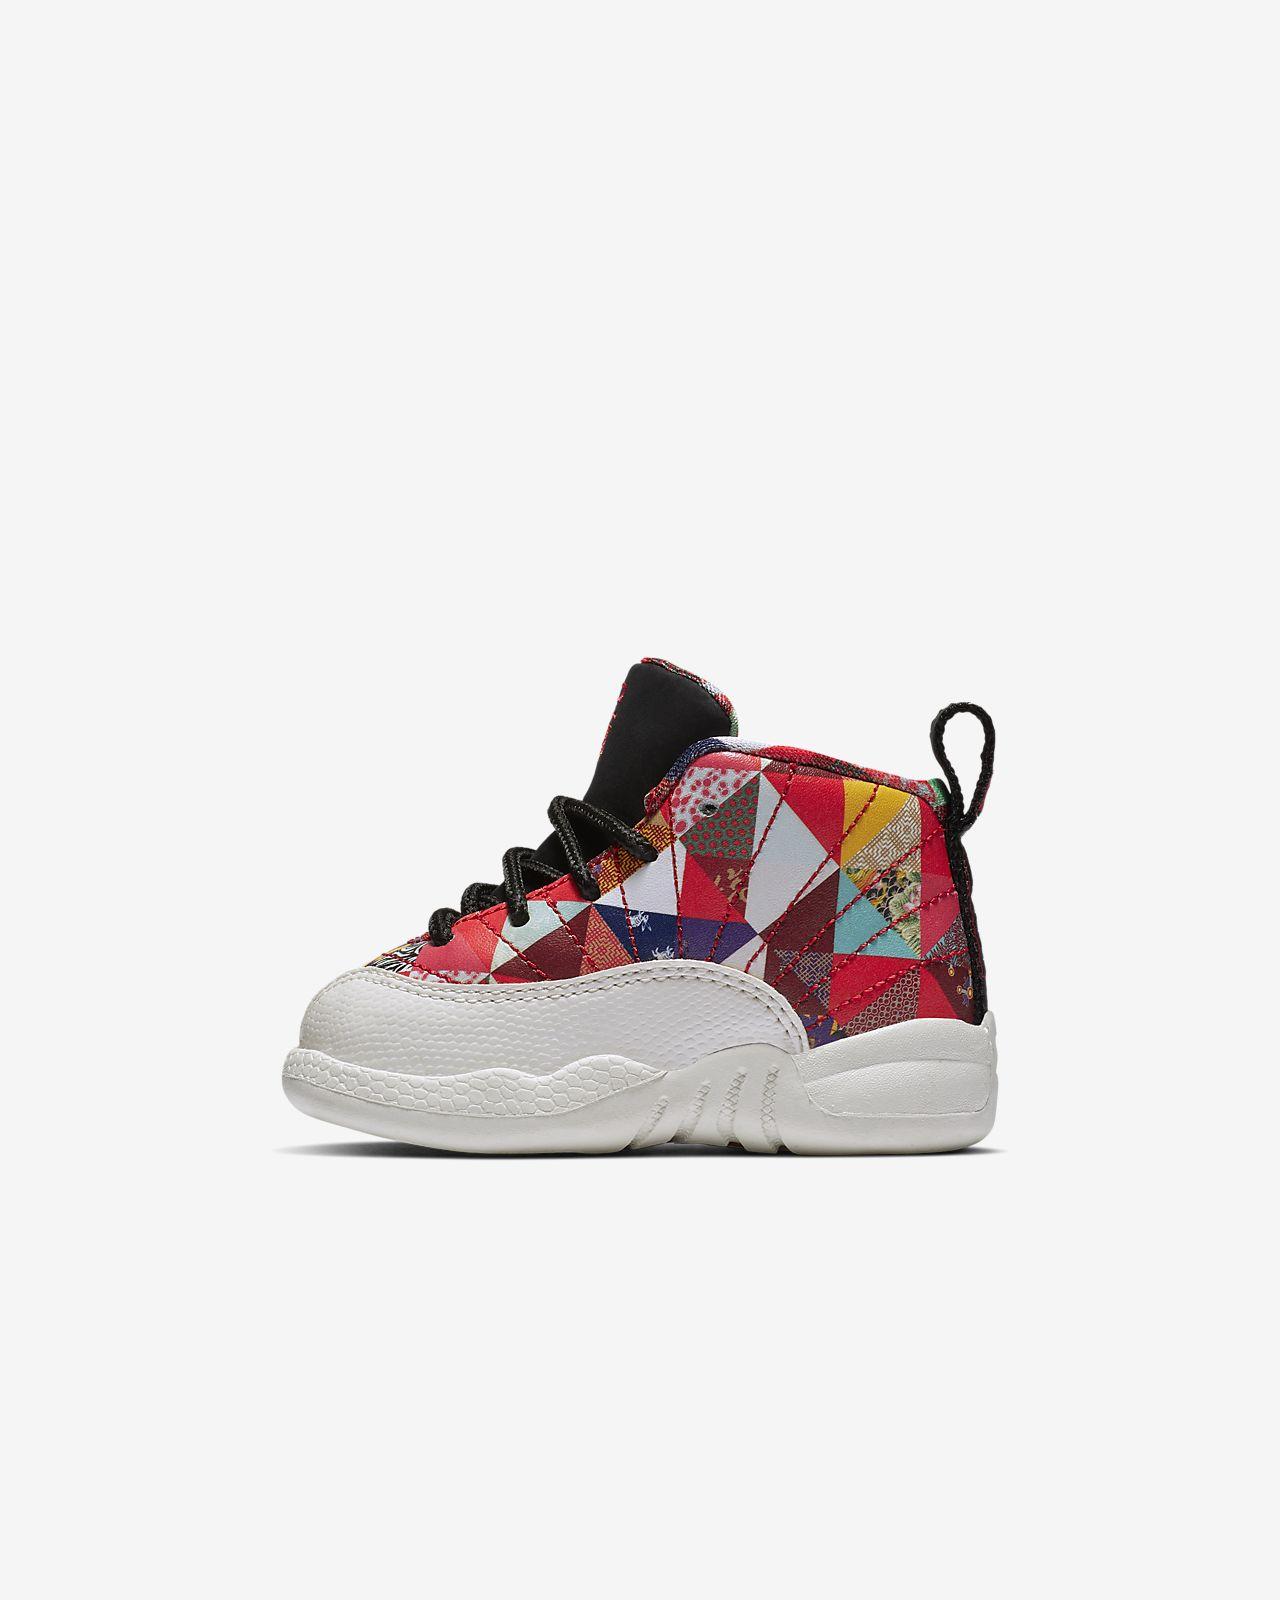 Jordan 12 Retro CNY (TD) 复刻婴童运动童鞋